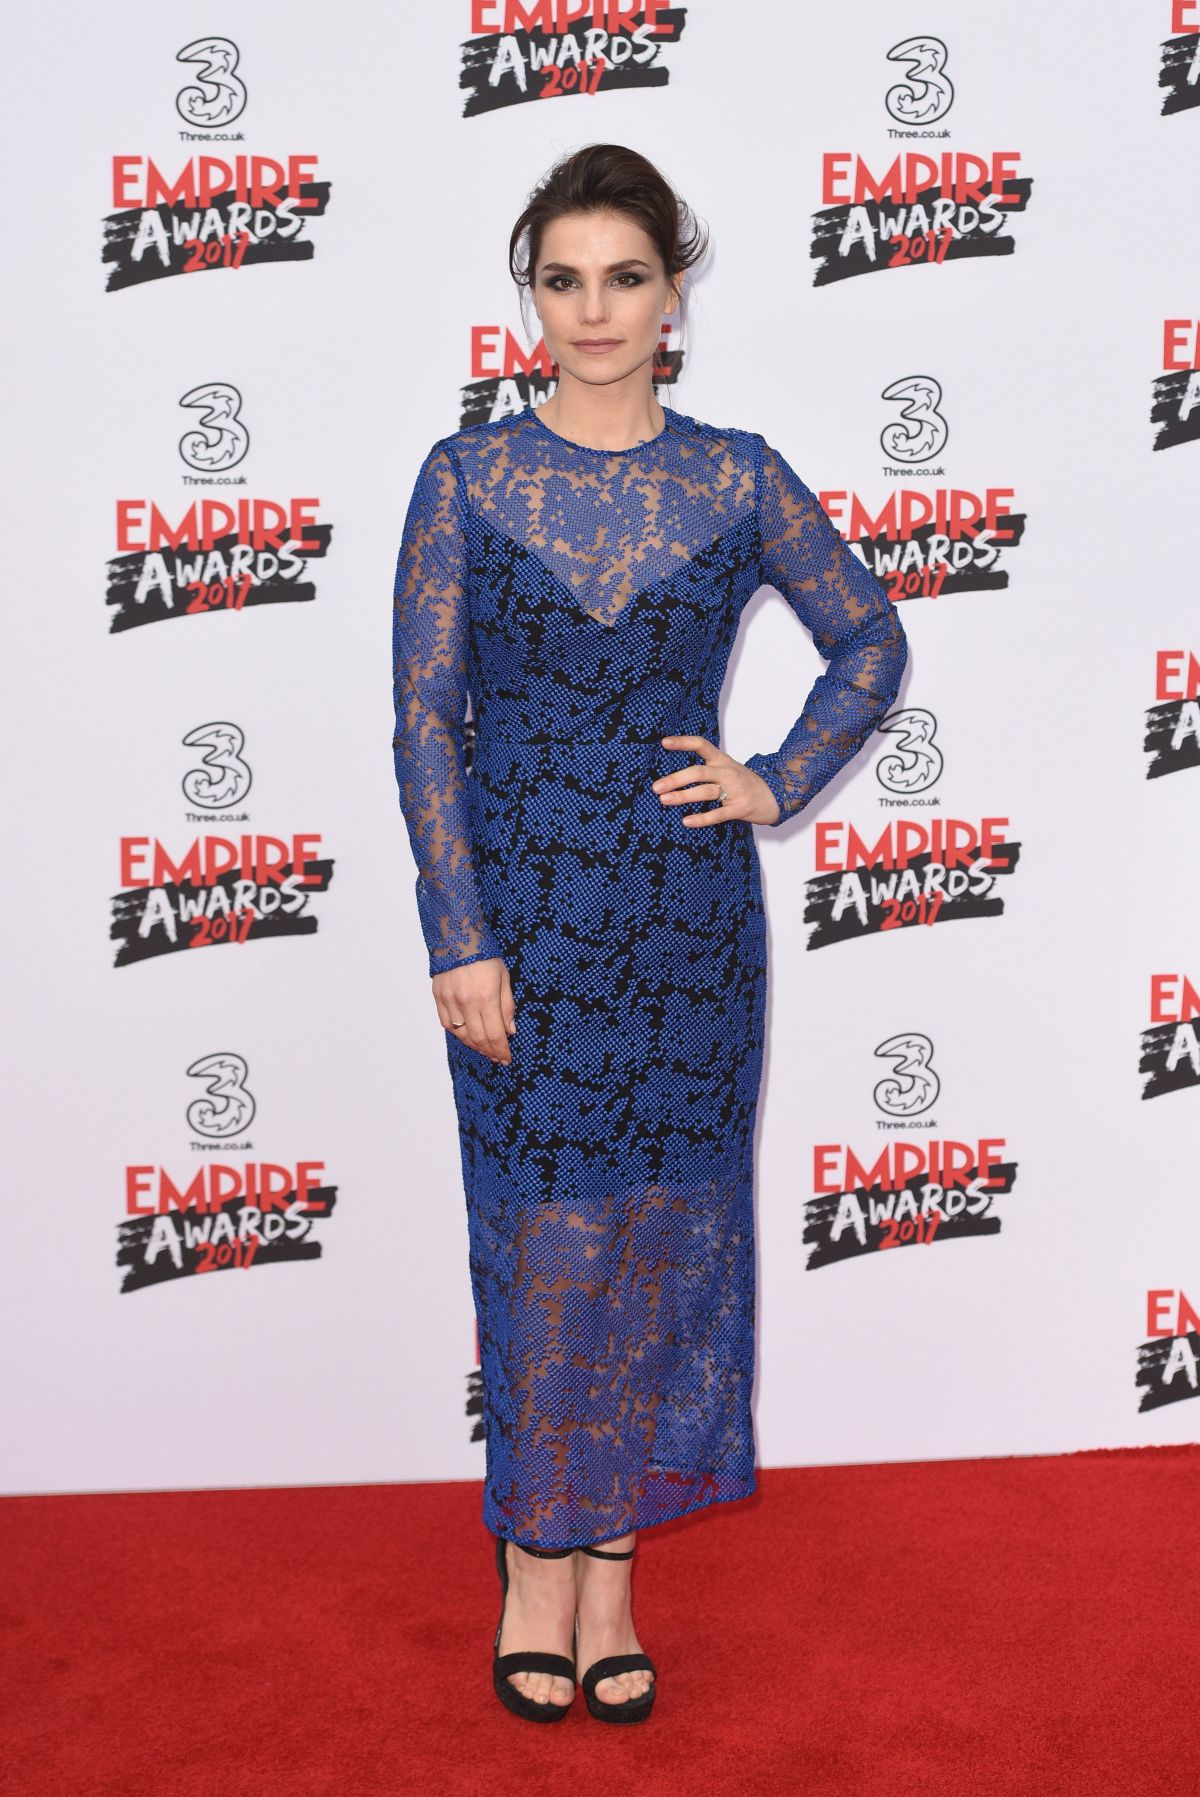 CHARLOTTE RILEY at Three Empire Awards in London 03/19/2017